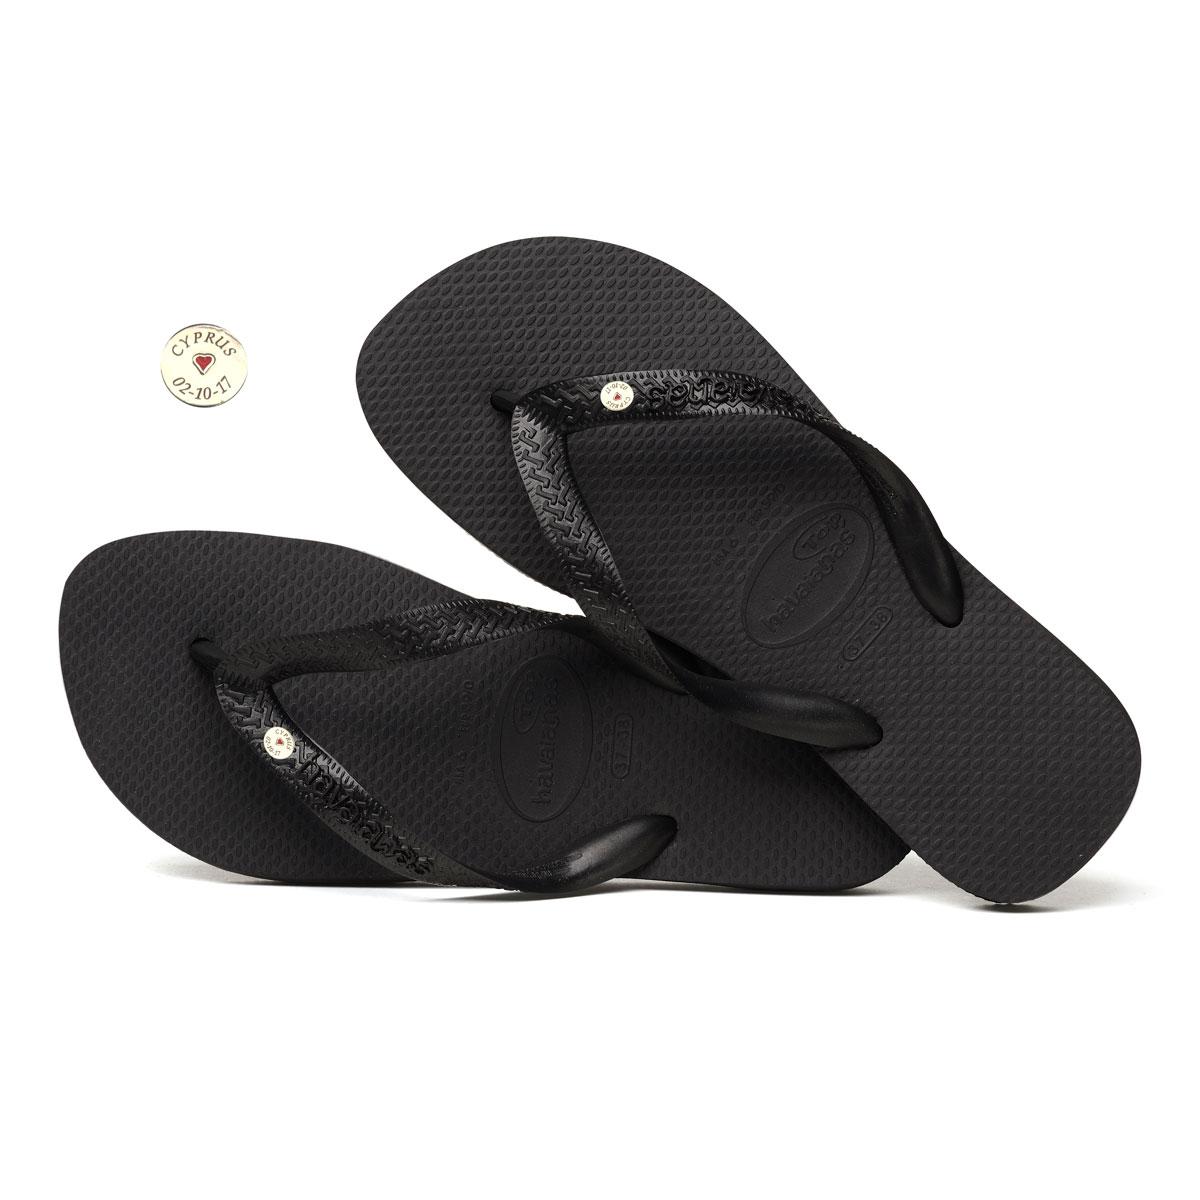 Round Silver Charm Havaianas Black Wedding Flip Flops Personalised